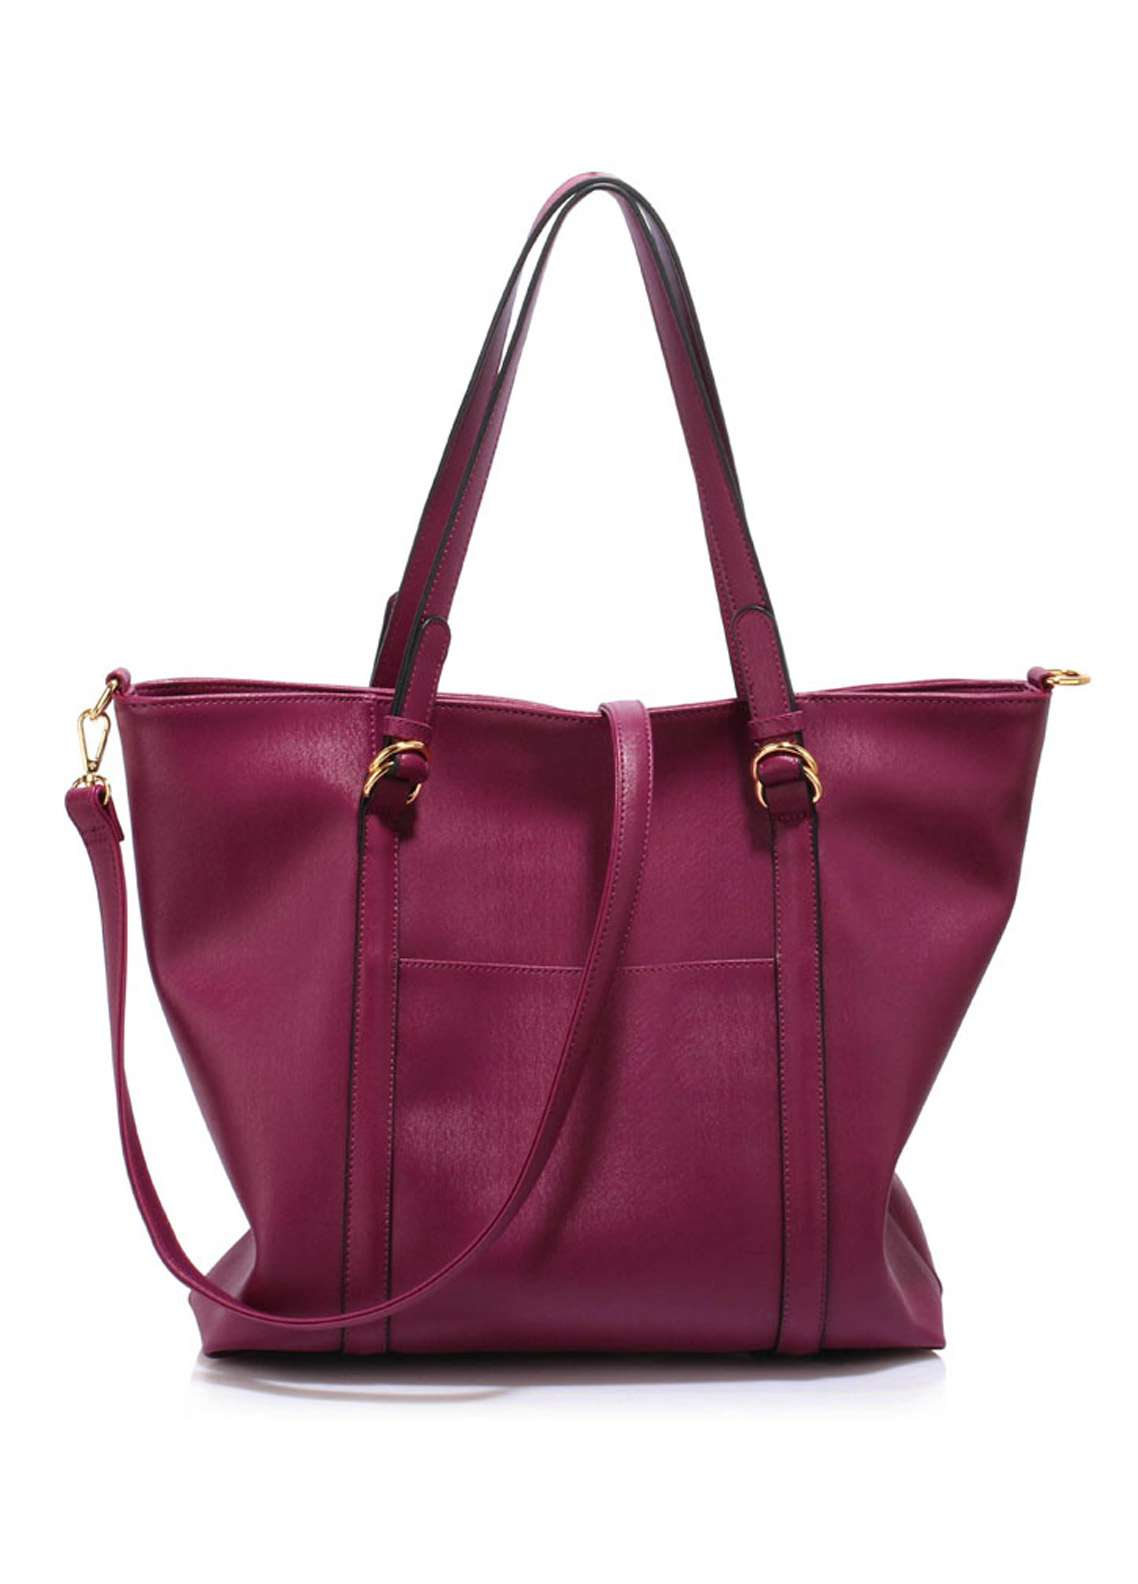 Leesun London Faux Leather Shoulder Bags for Women Burgundy